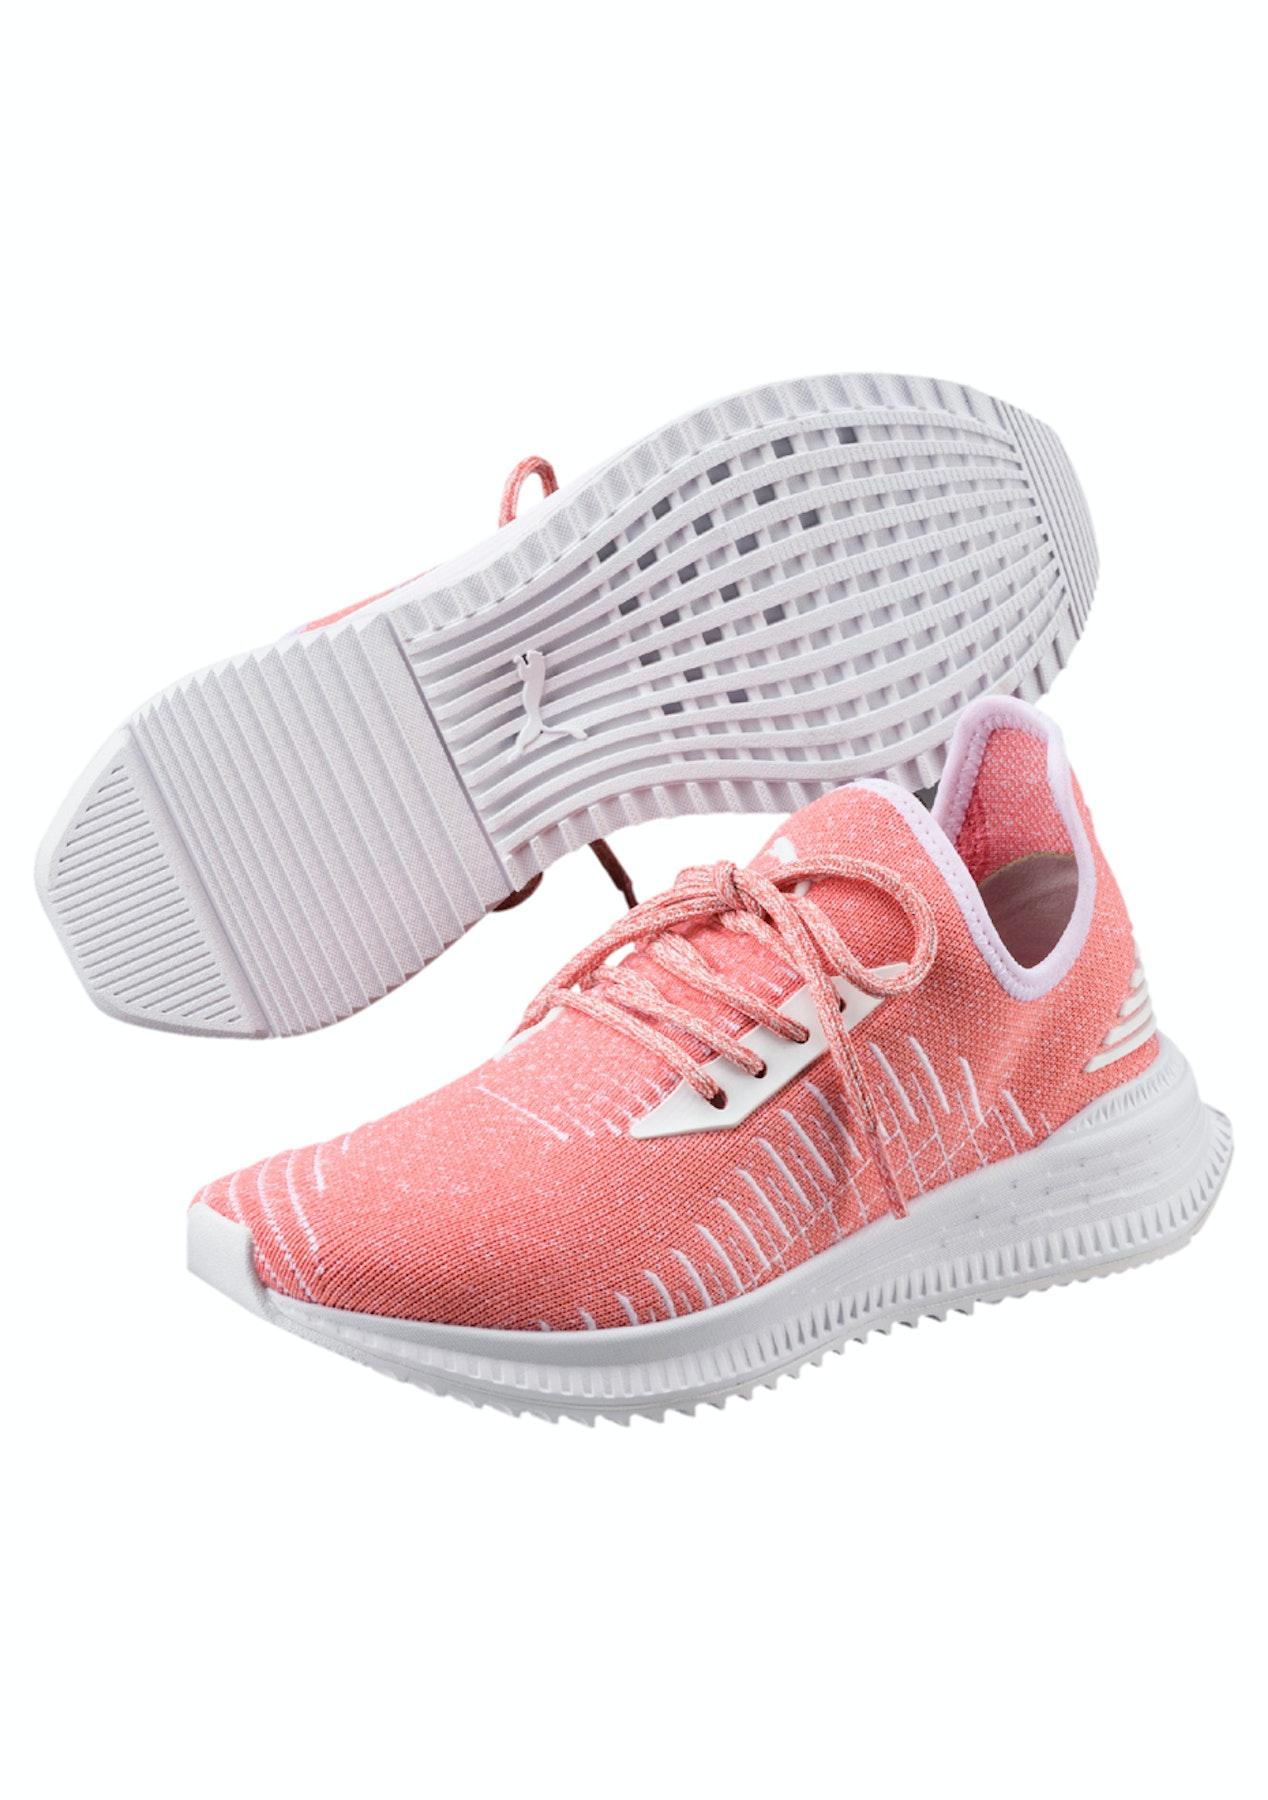 new product 02351 a1e04 Puma Womens - Tsugi-Mi Evoknit - Shell Pink